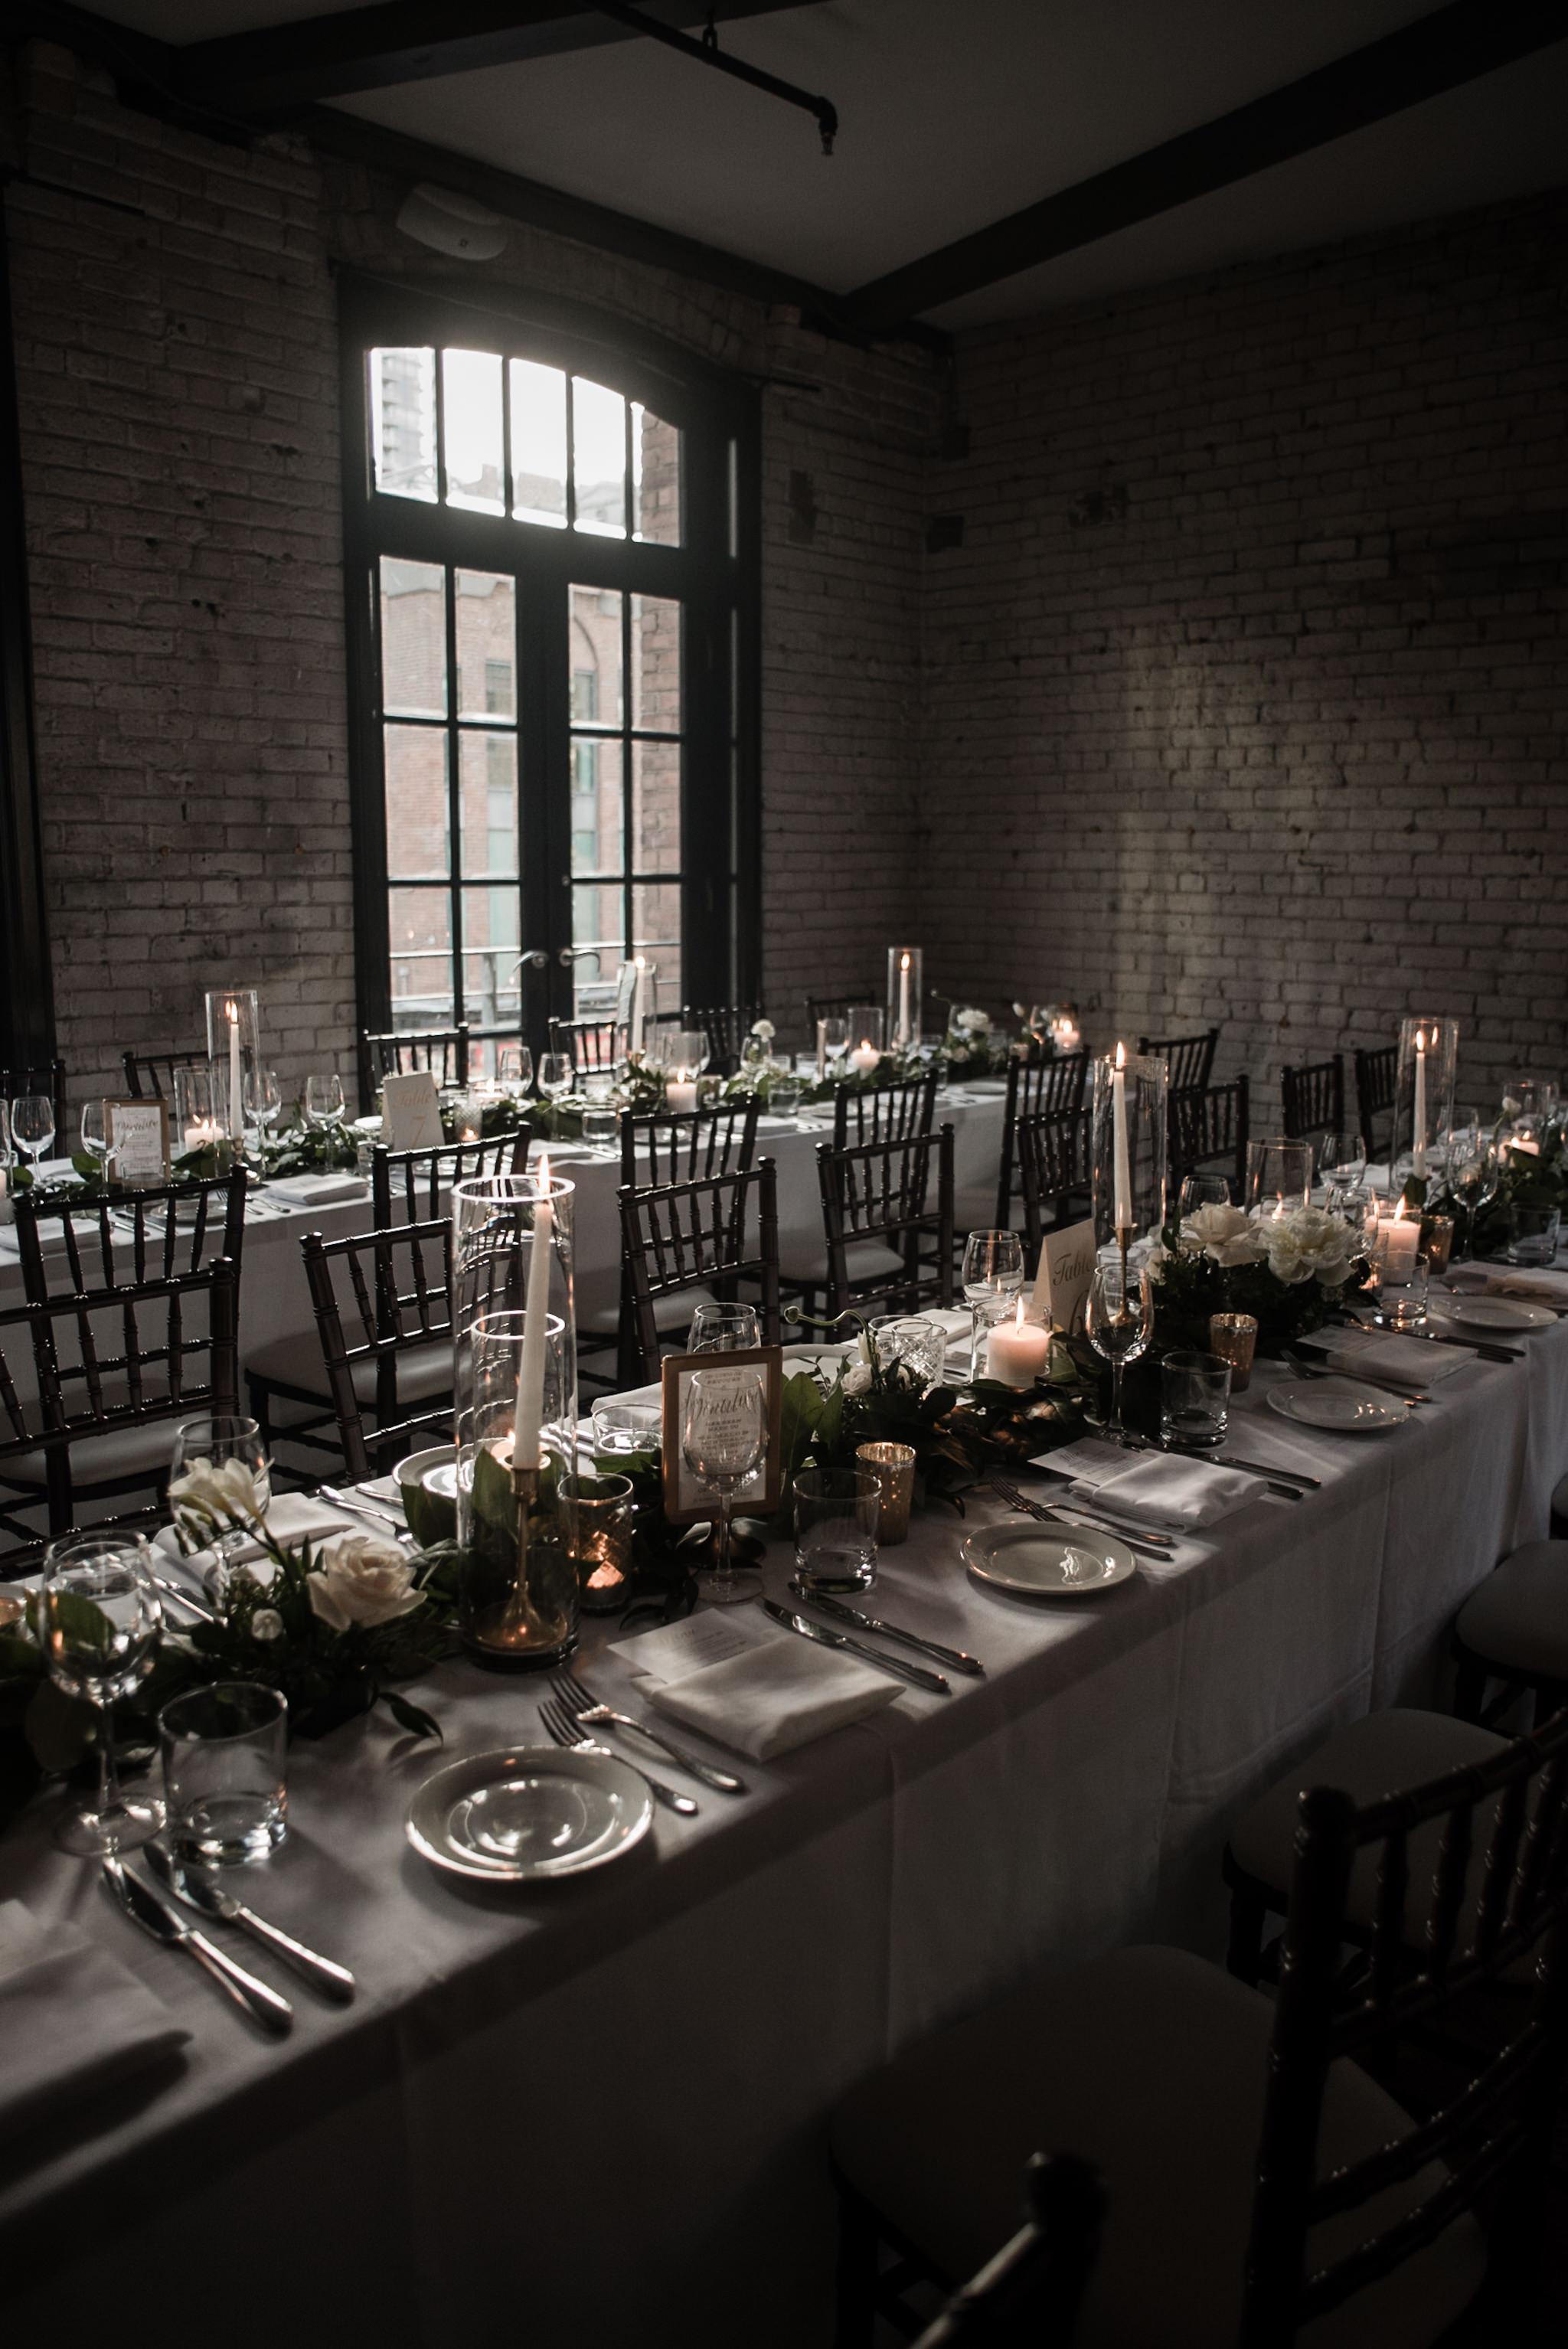 085-storys-building-reception-decor-candles-garland-romantic-industrial.jpg